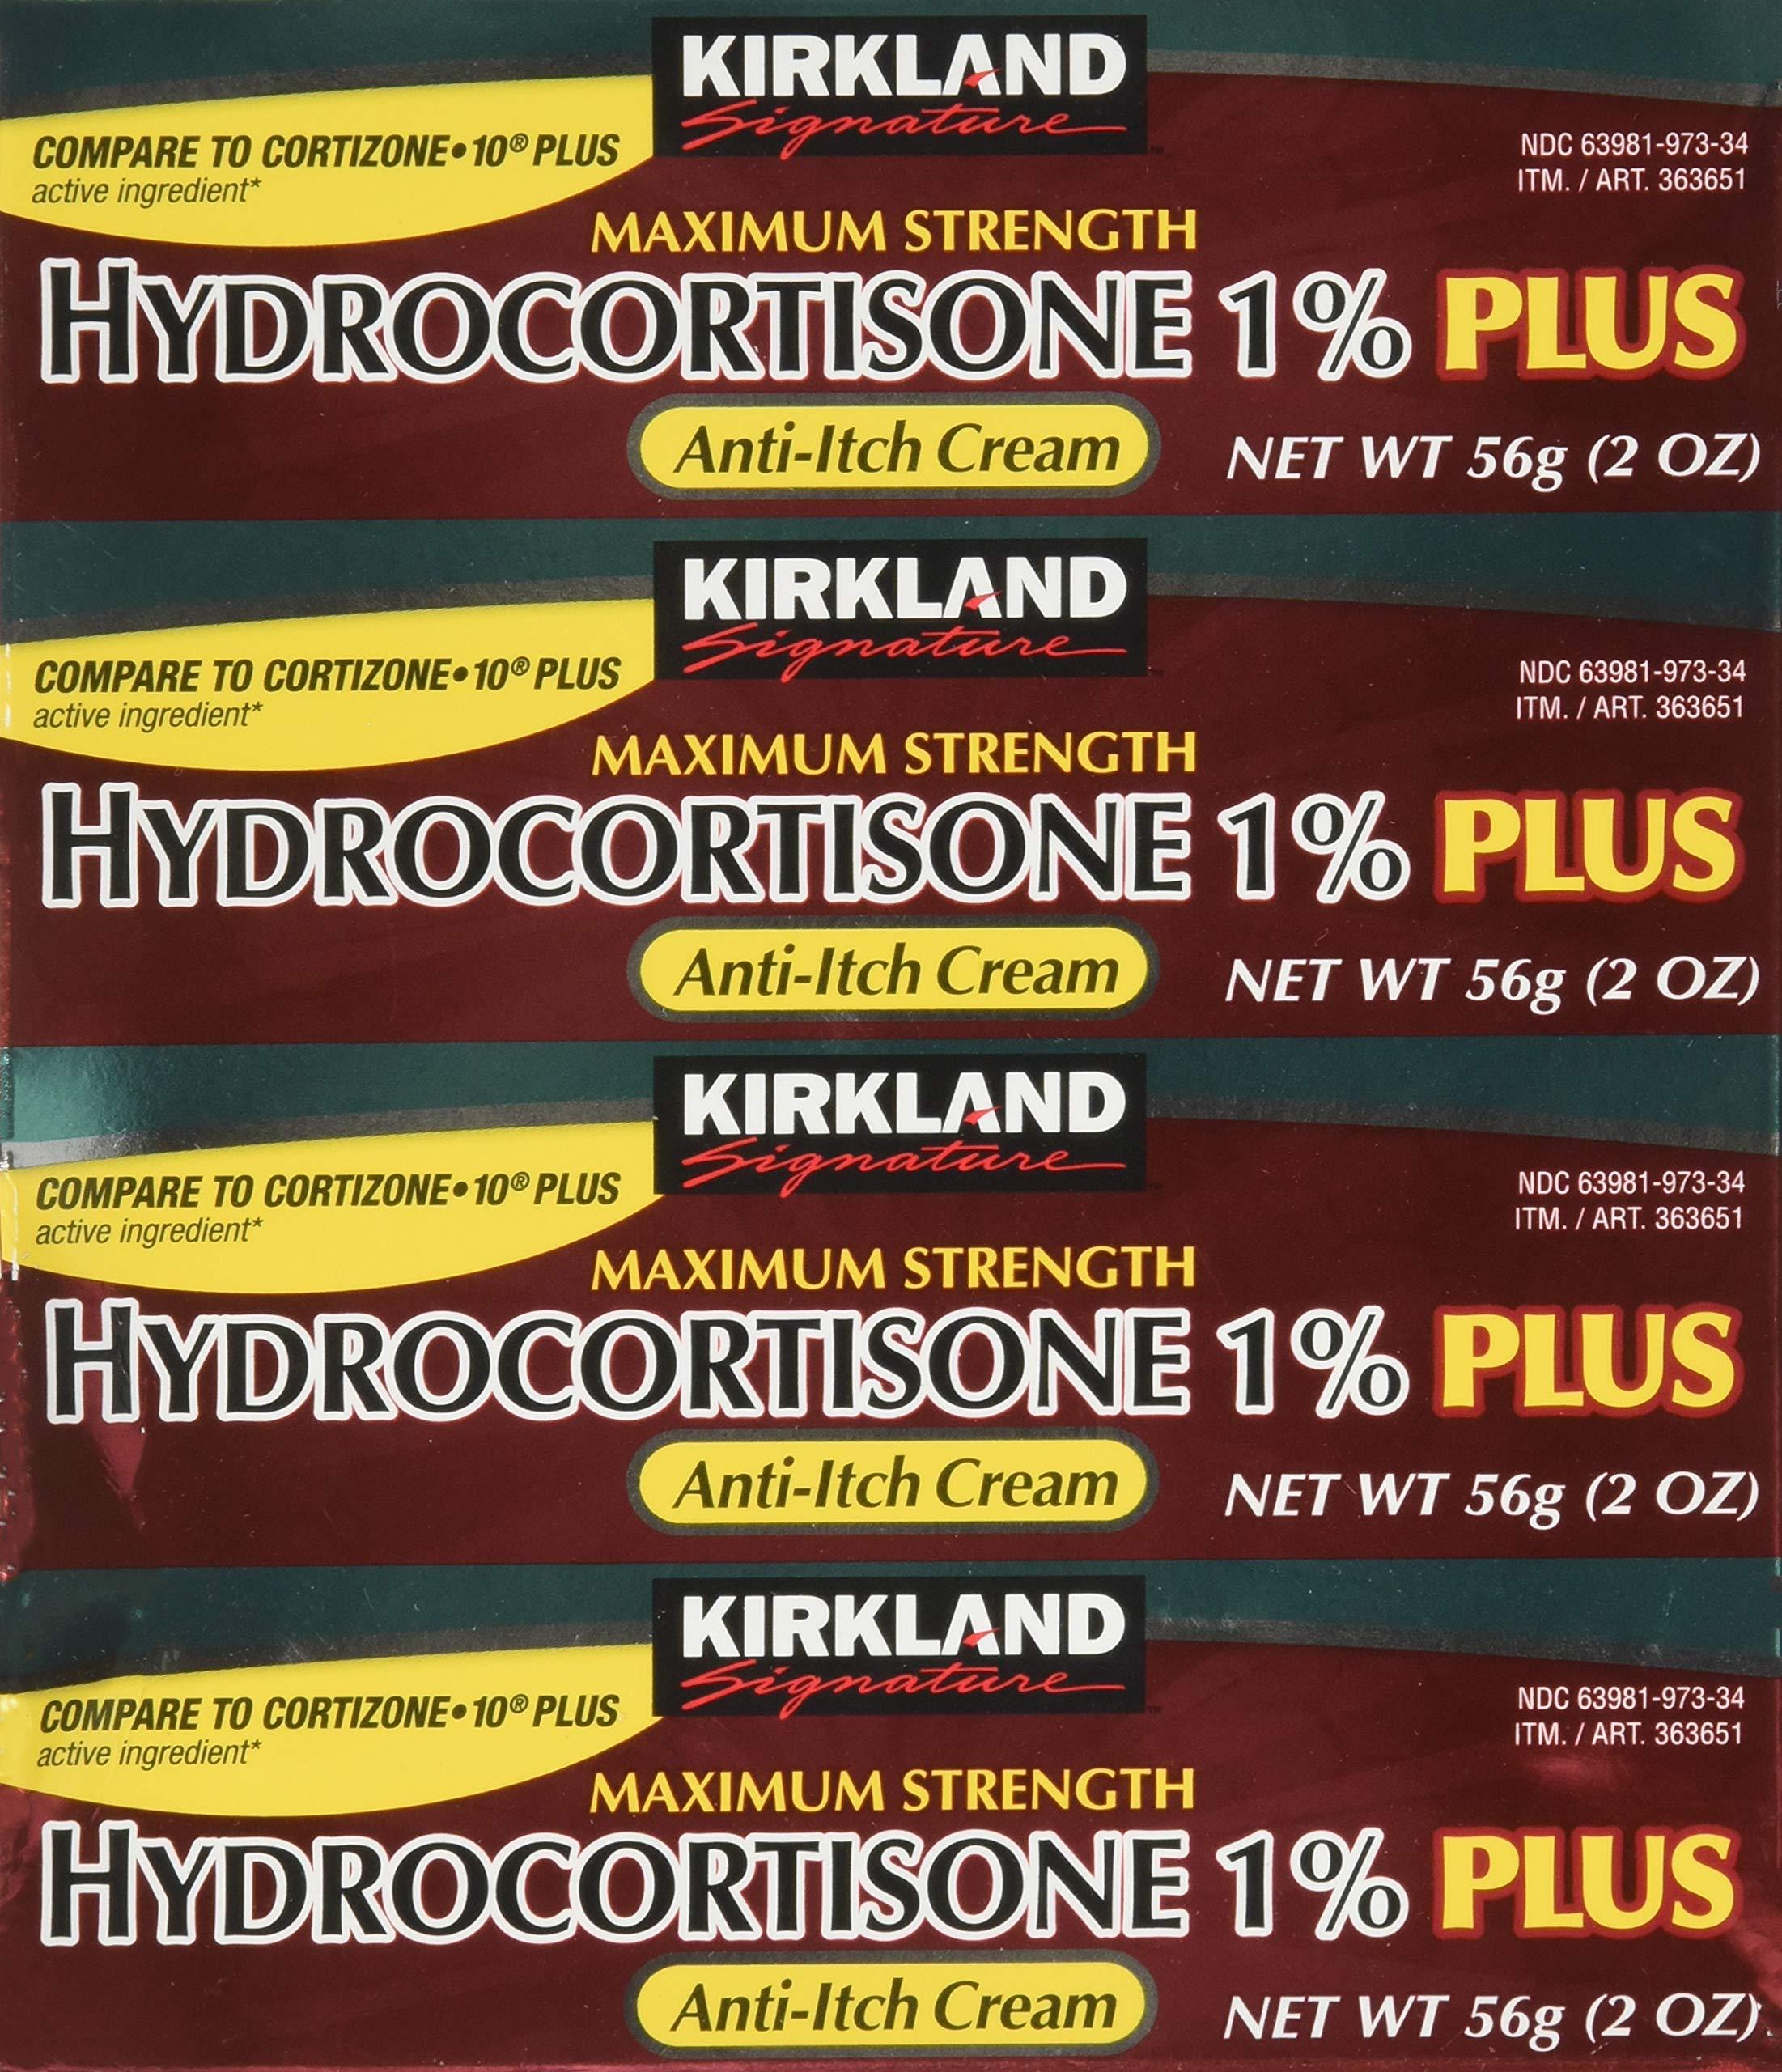 Kirkland Signature Maximum Strength Hydrocortisone Cream 1% with Aloe, 2-ounce (pack of 4) by Kirkland Signature